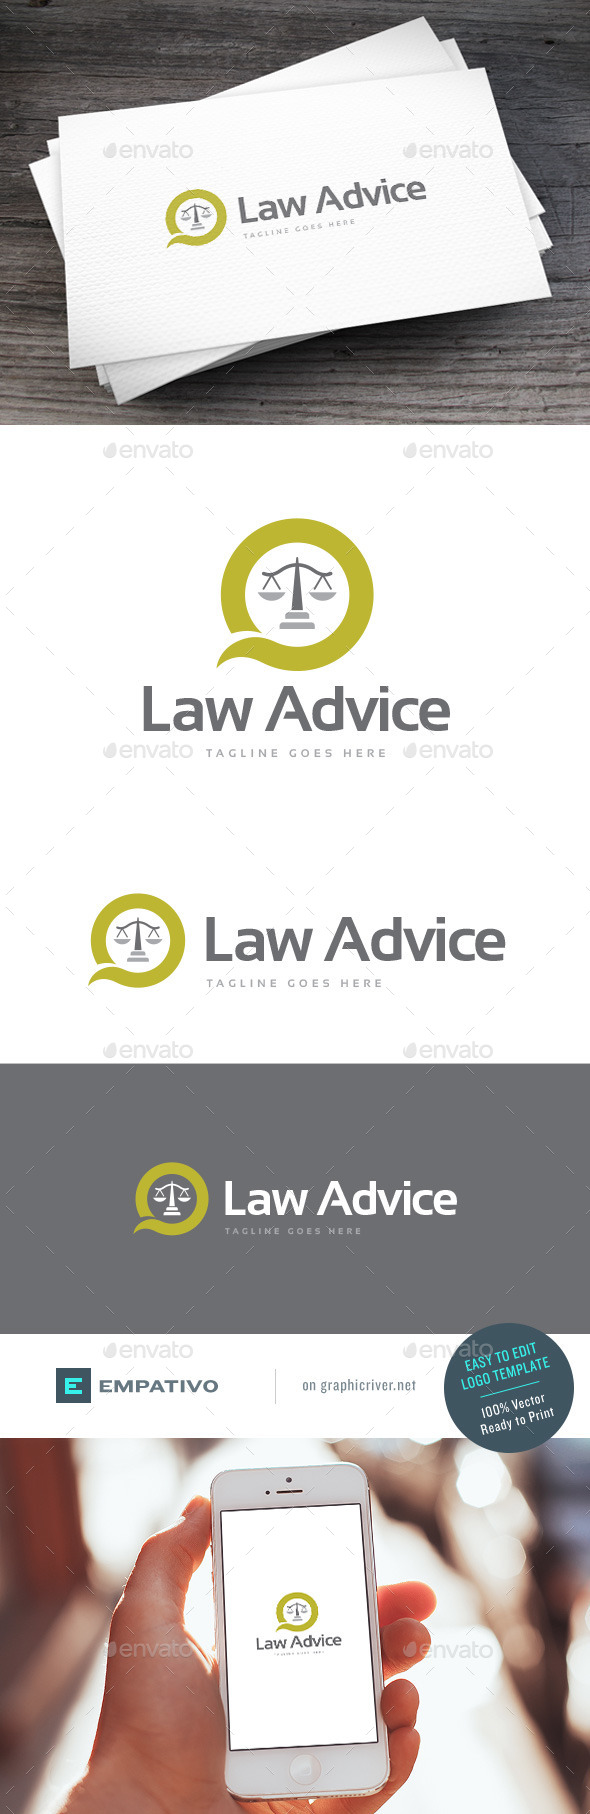 GraphicRiver Law Advice Logo Template 11378419